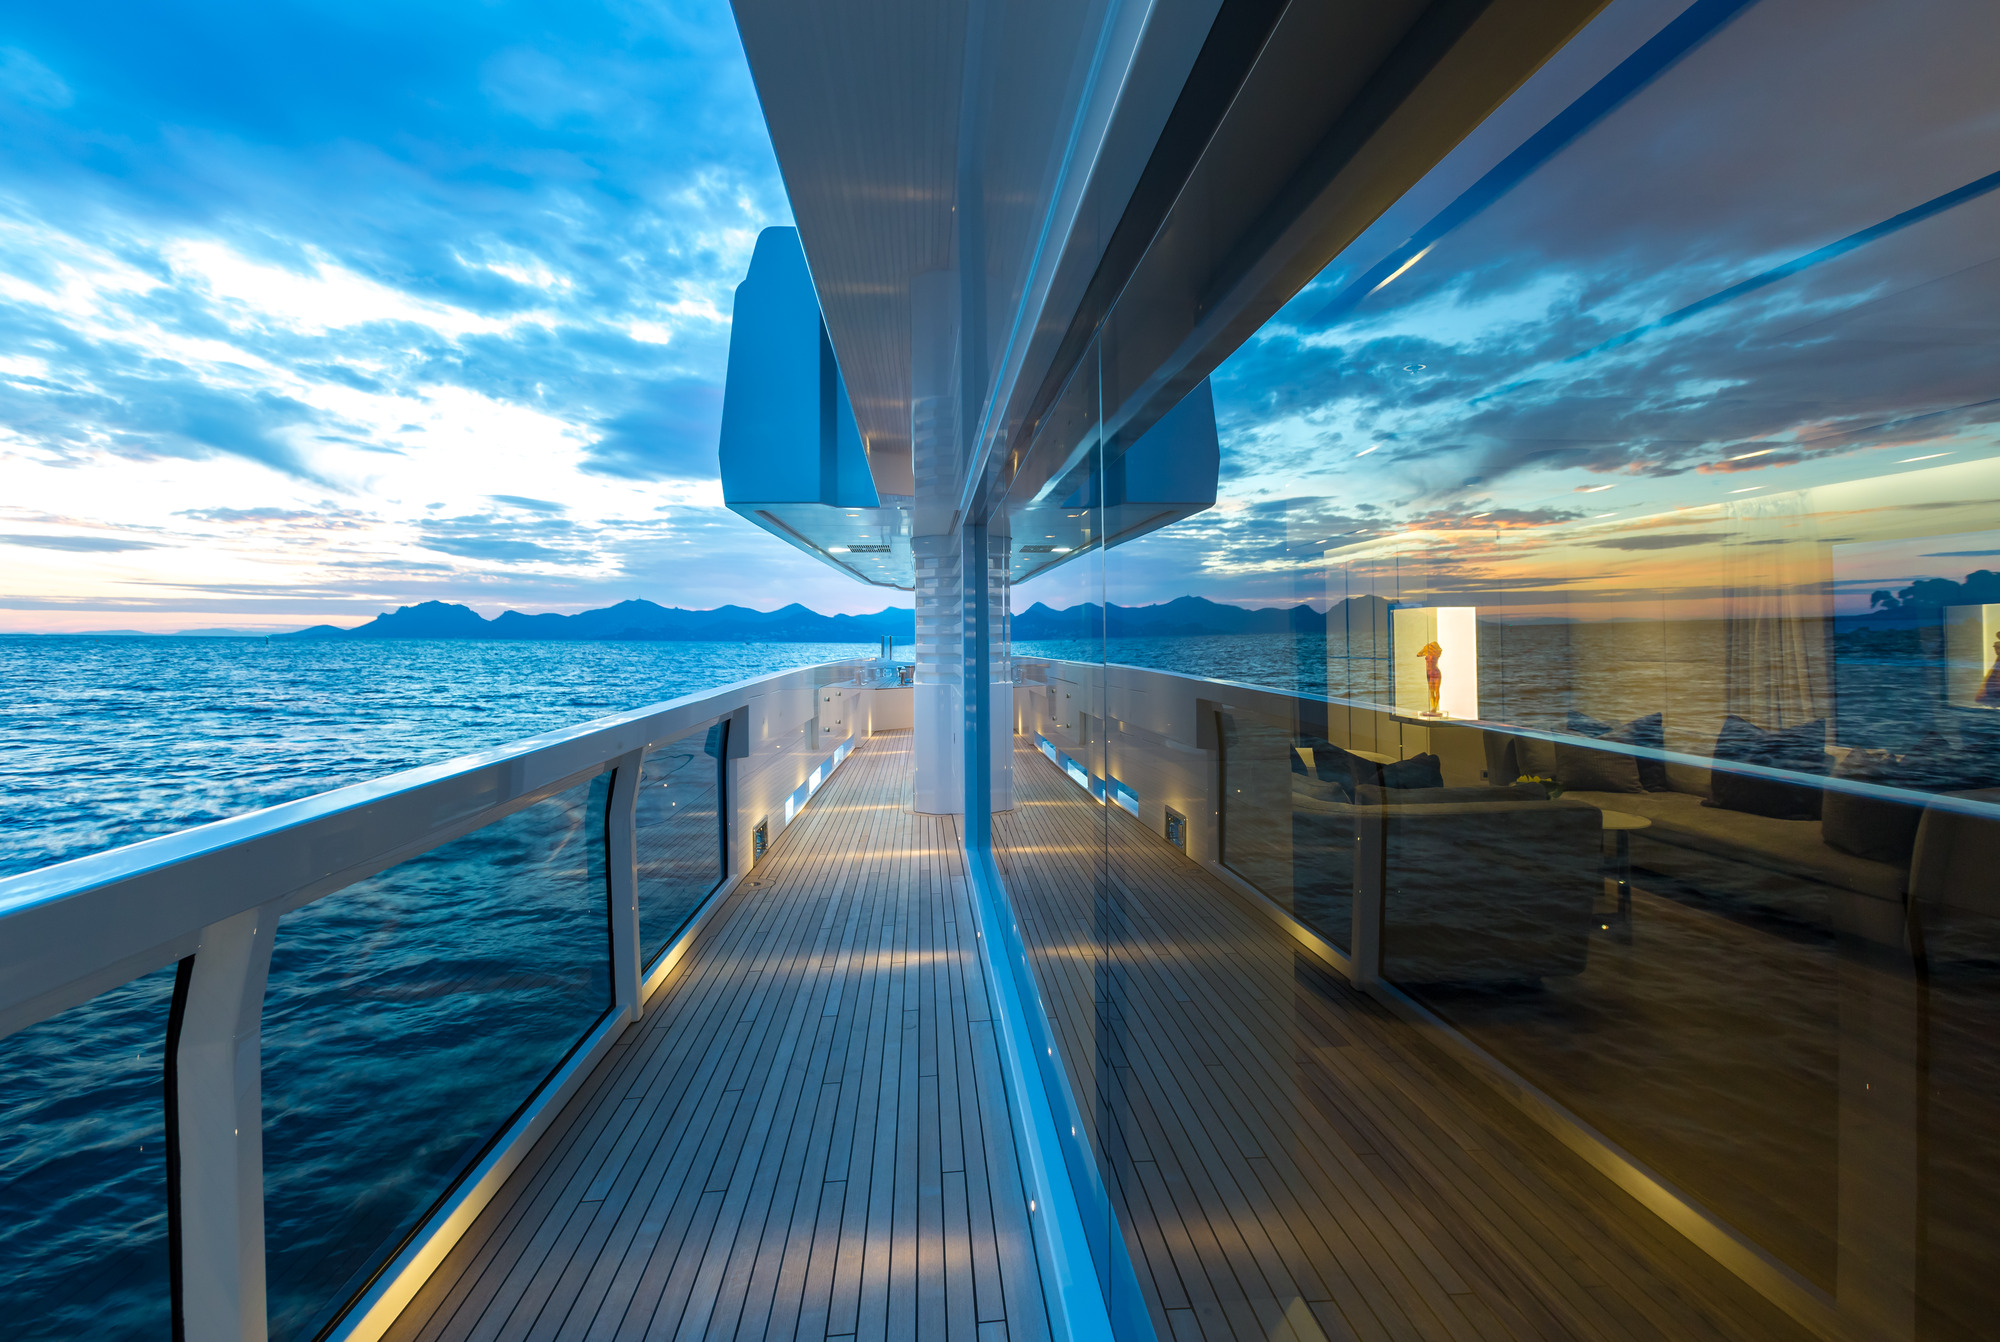 Alquiler de barcos baratos en Cannes. Yates de alquiler en Cannes